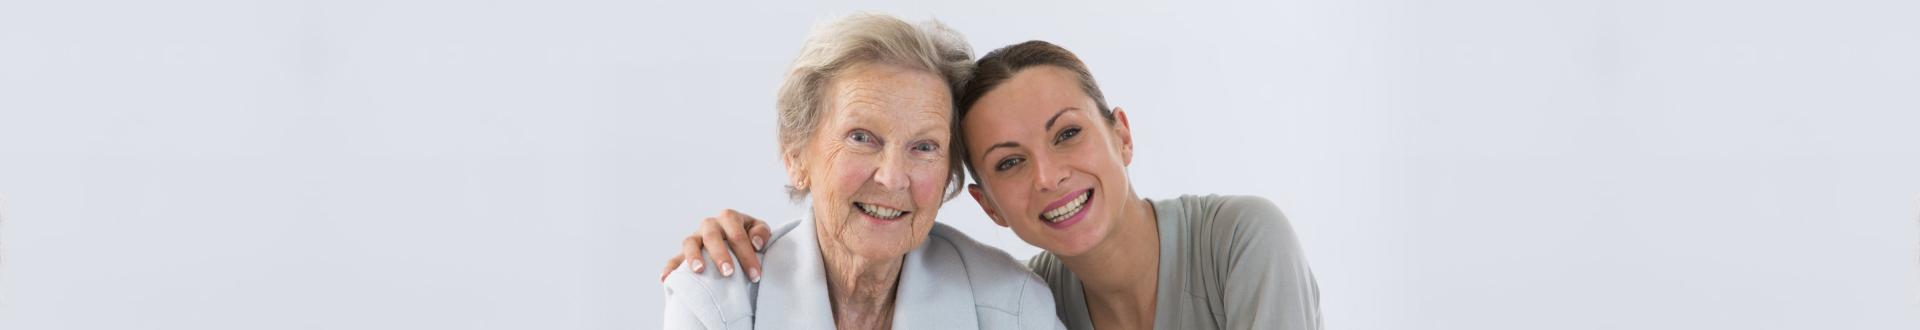 female caregiver with senior woman smiling